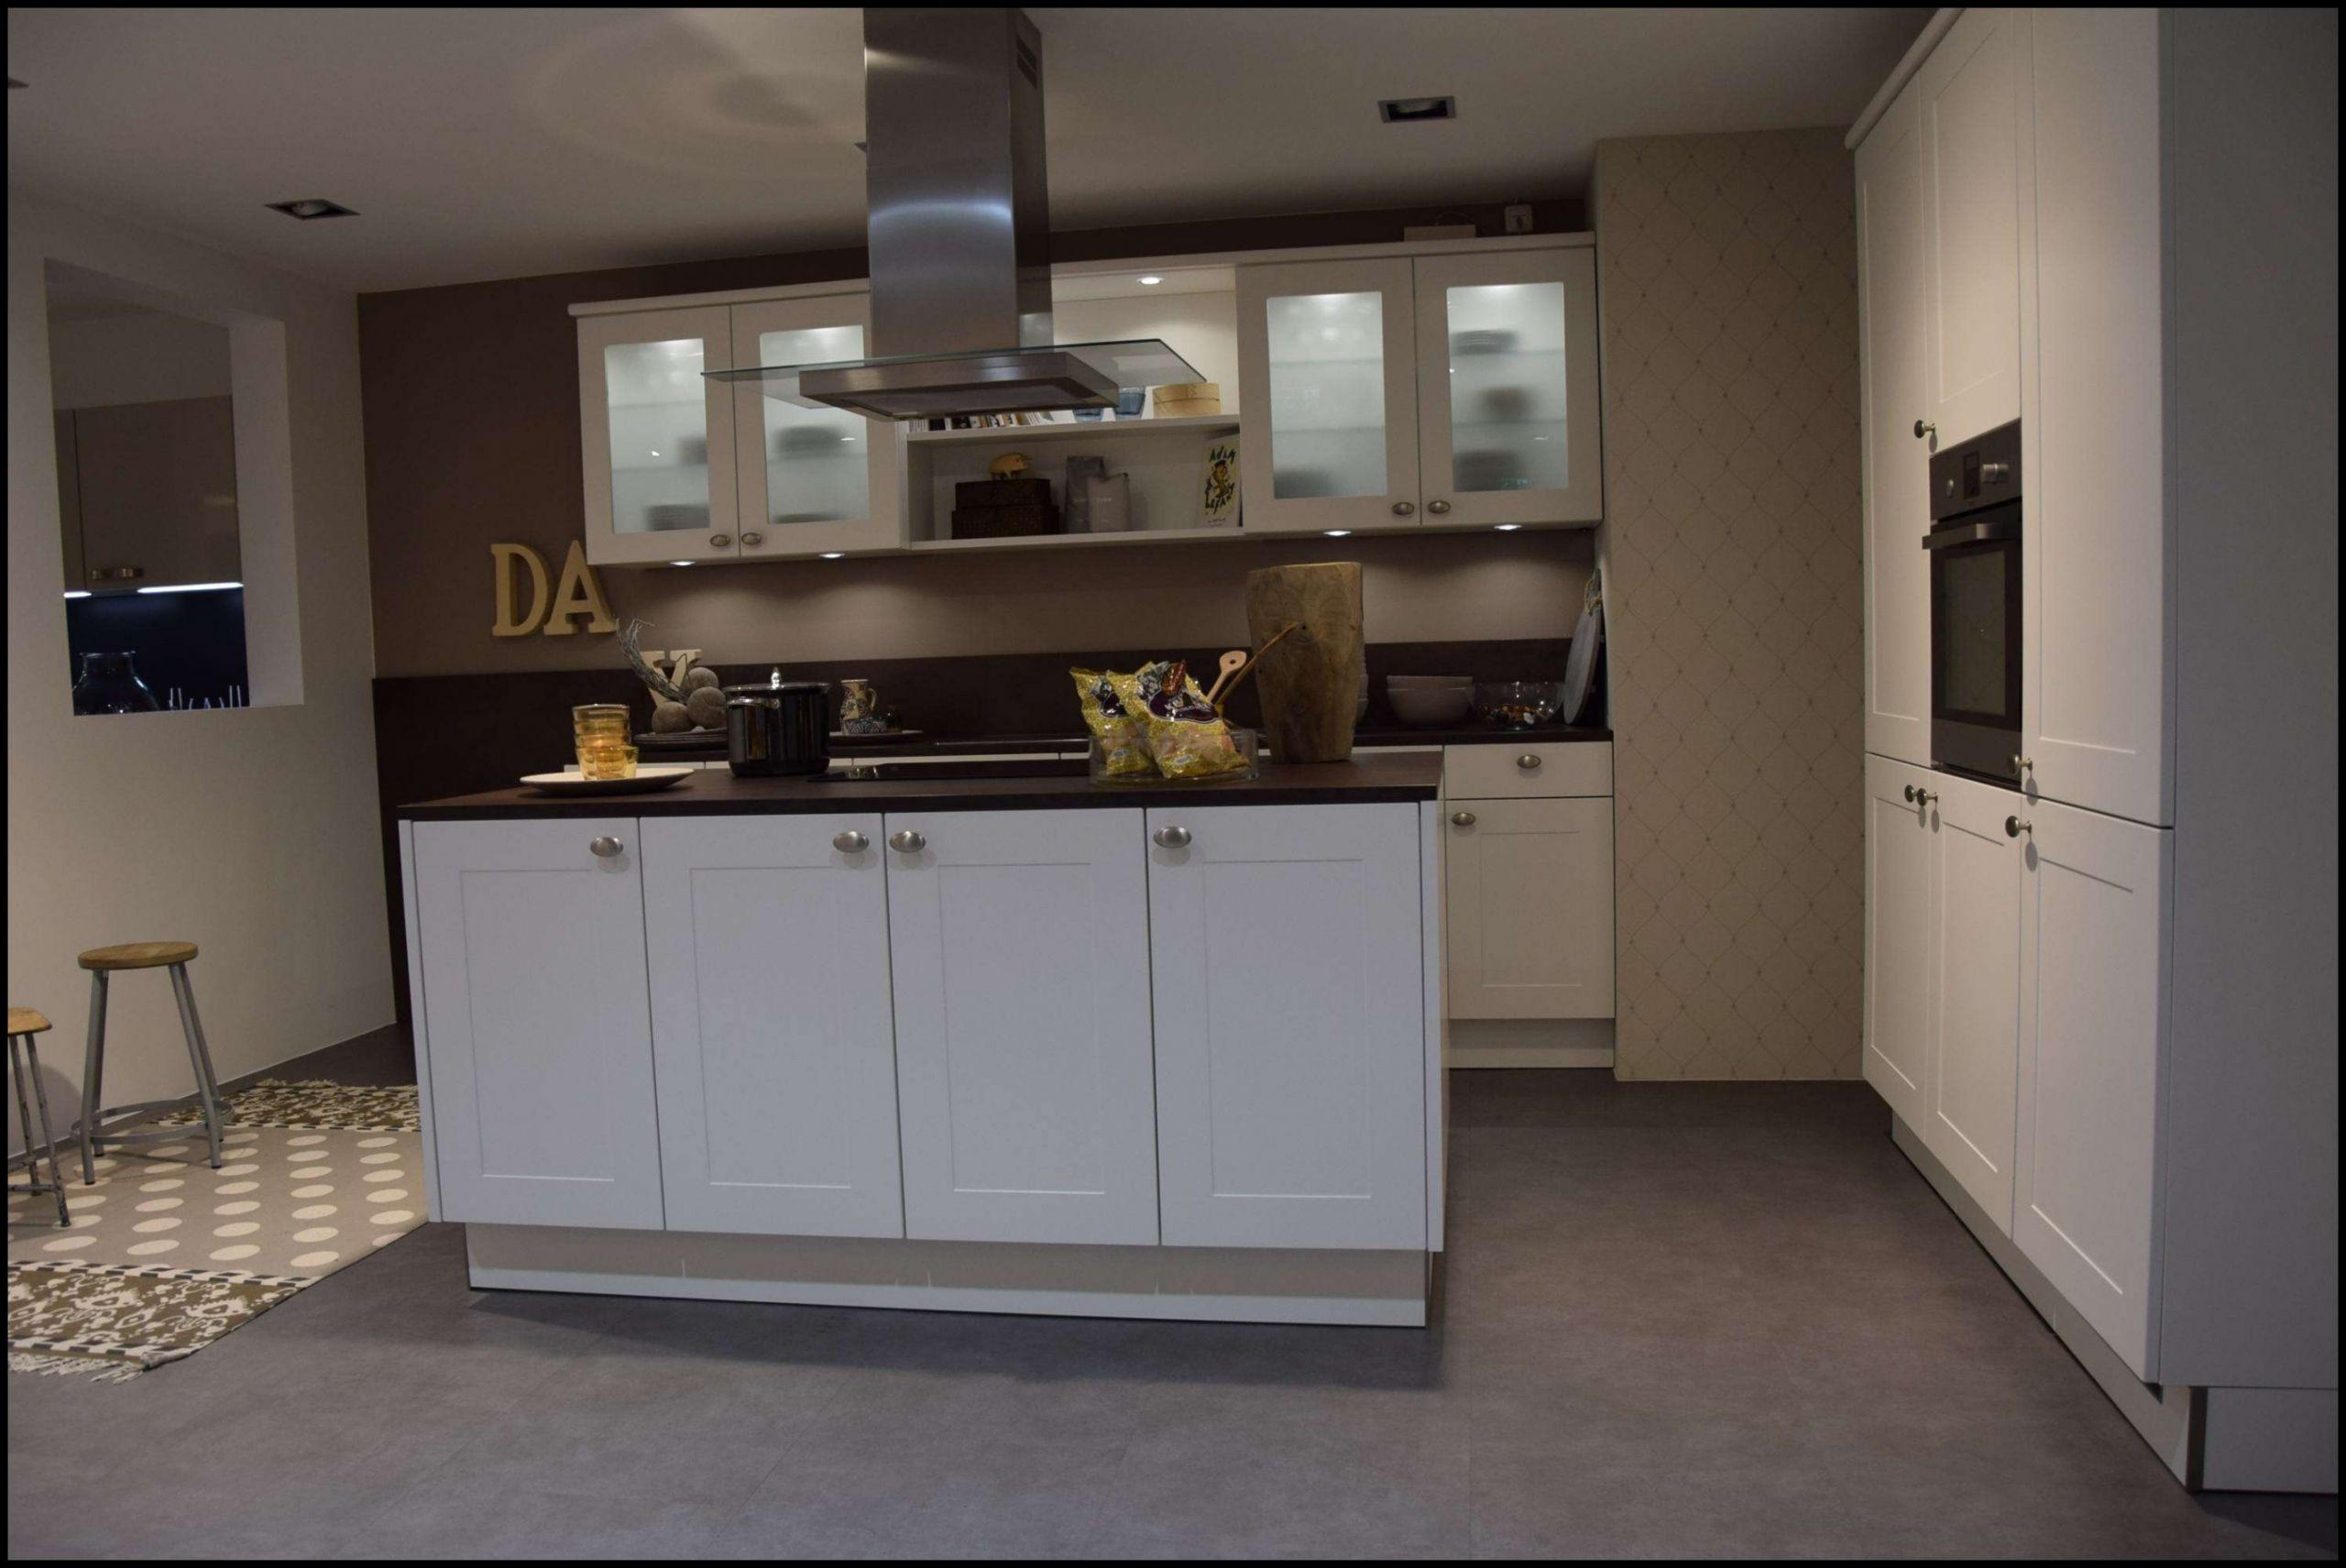 45 luxus deko ideen kuche galerie kuchen fur dachgeschosswohnungen kuchen fur dachgeschosswohnungen 7